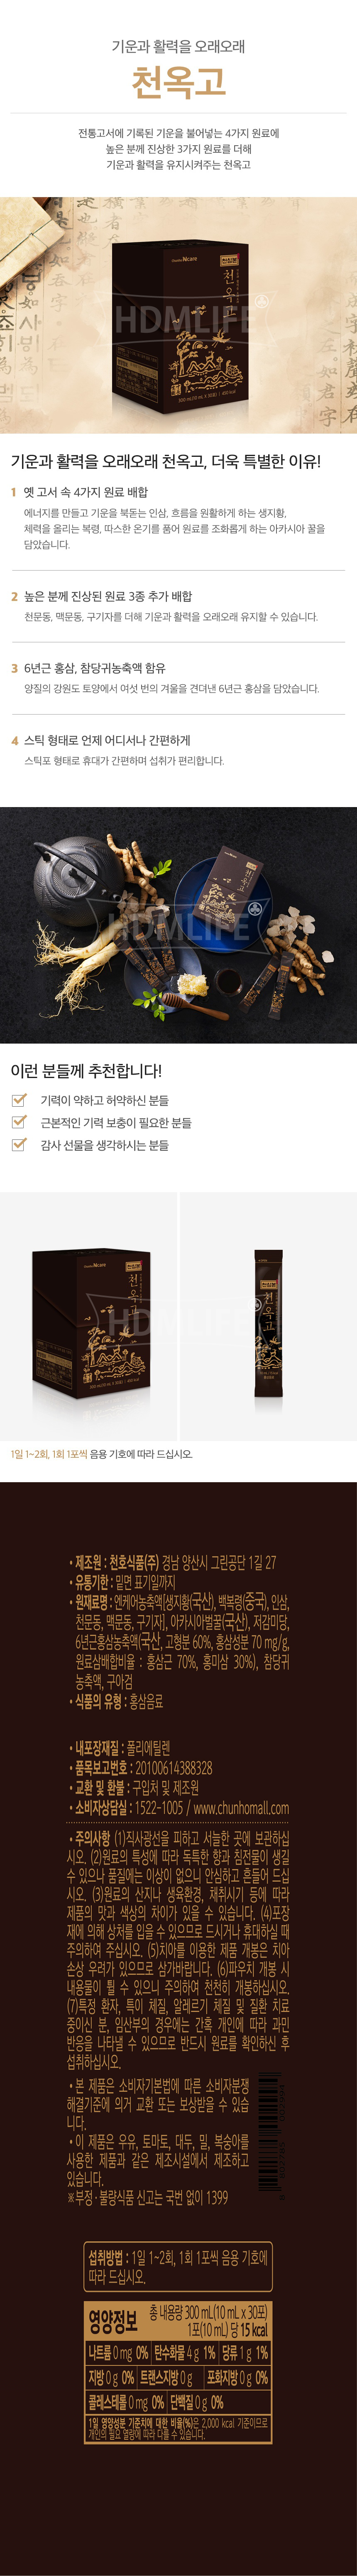 Cheonokgo_10x30_info.png